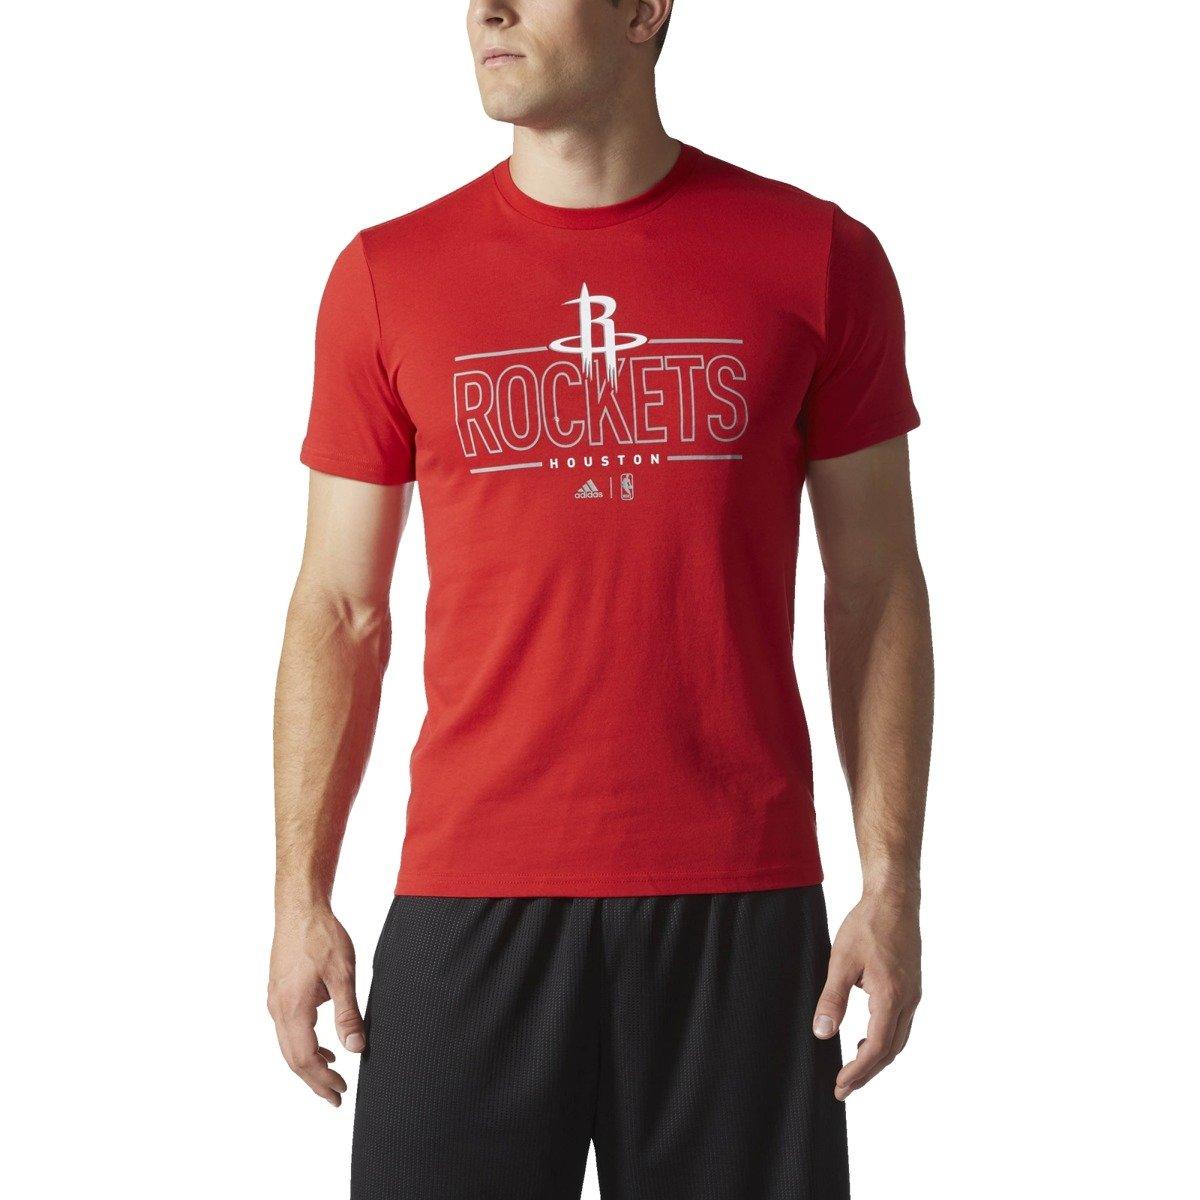 cfbf66cc2 Houston Rockets adidas Apparel